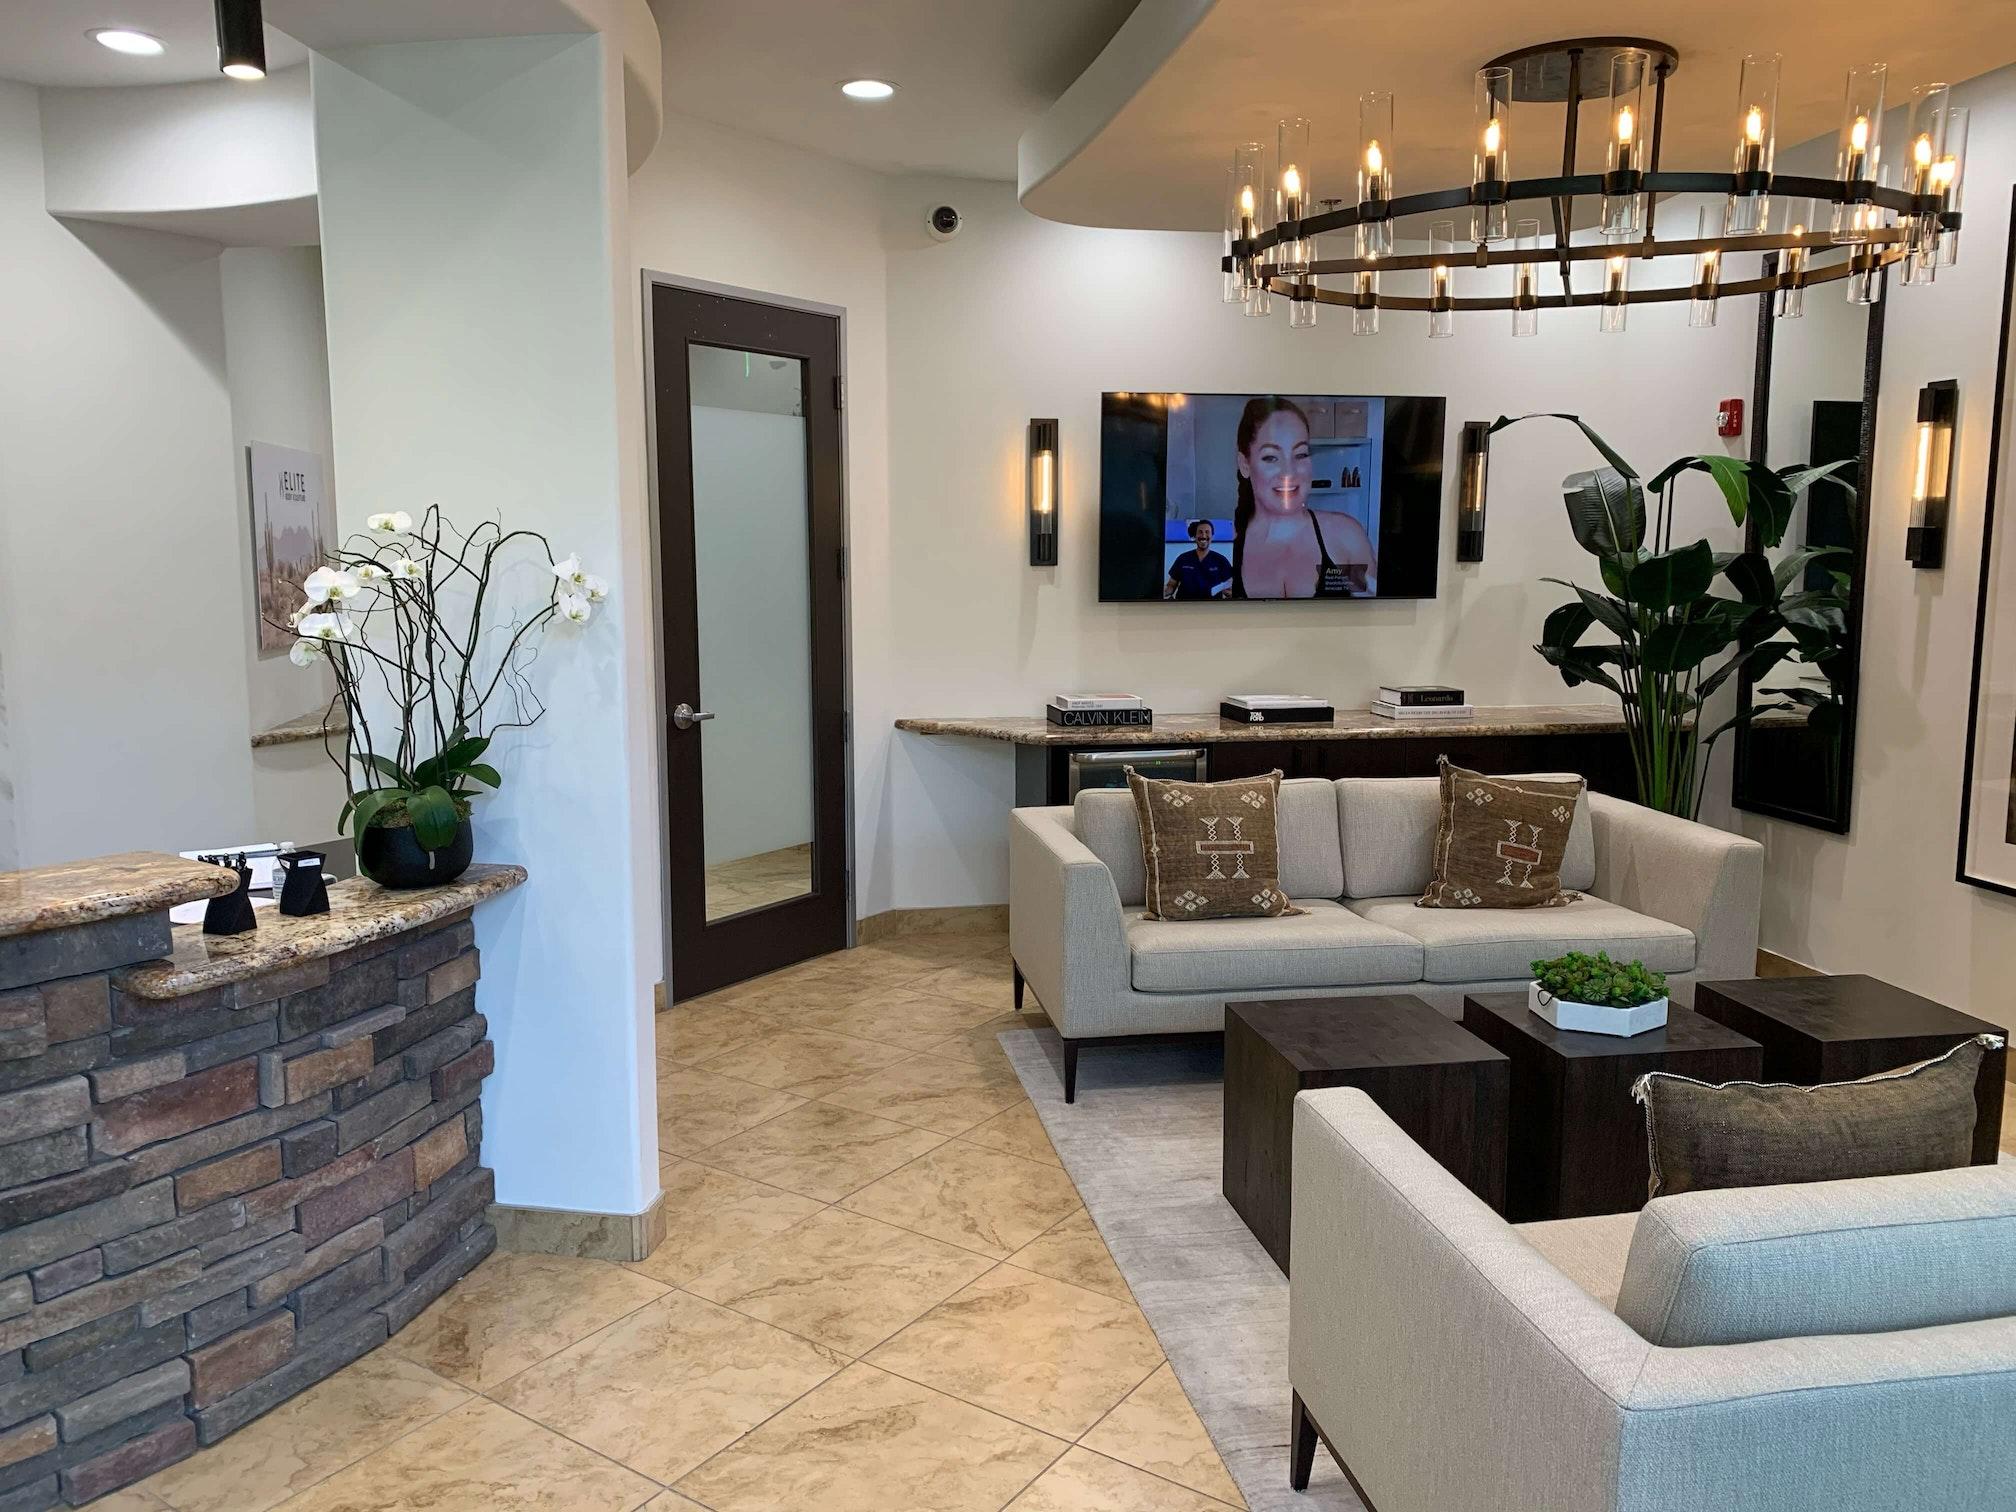 Scottsdale Medical Spa